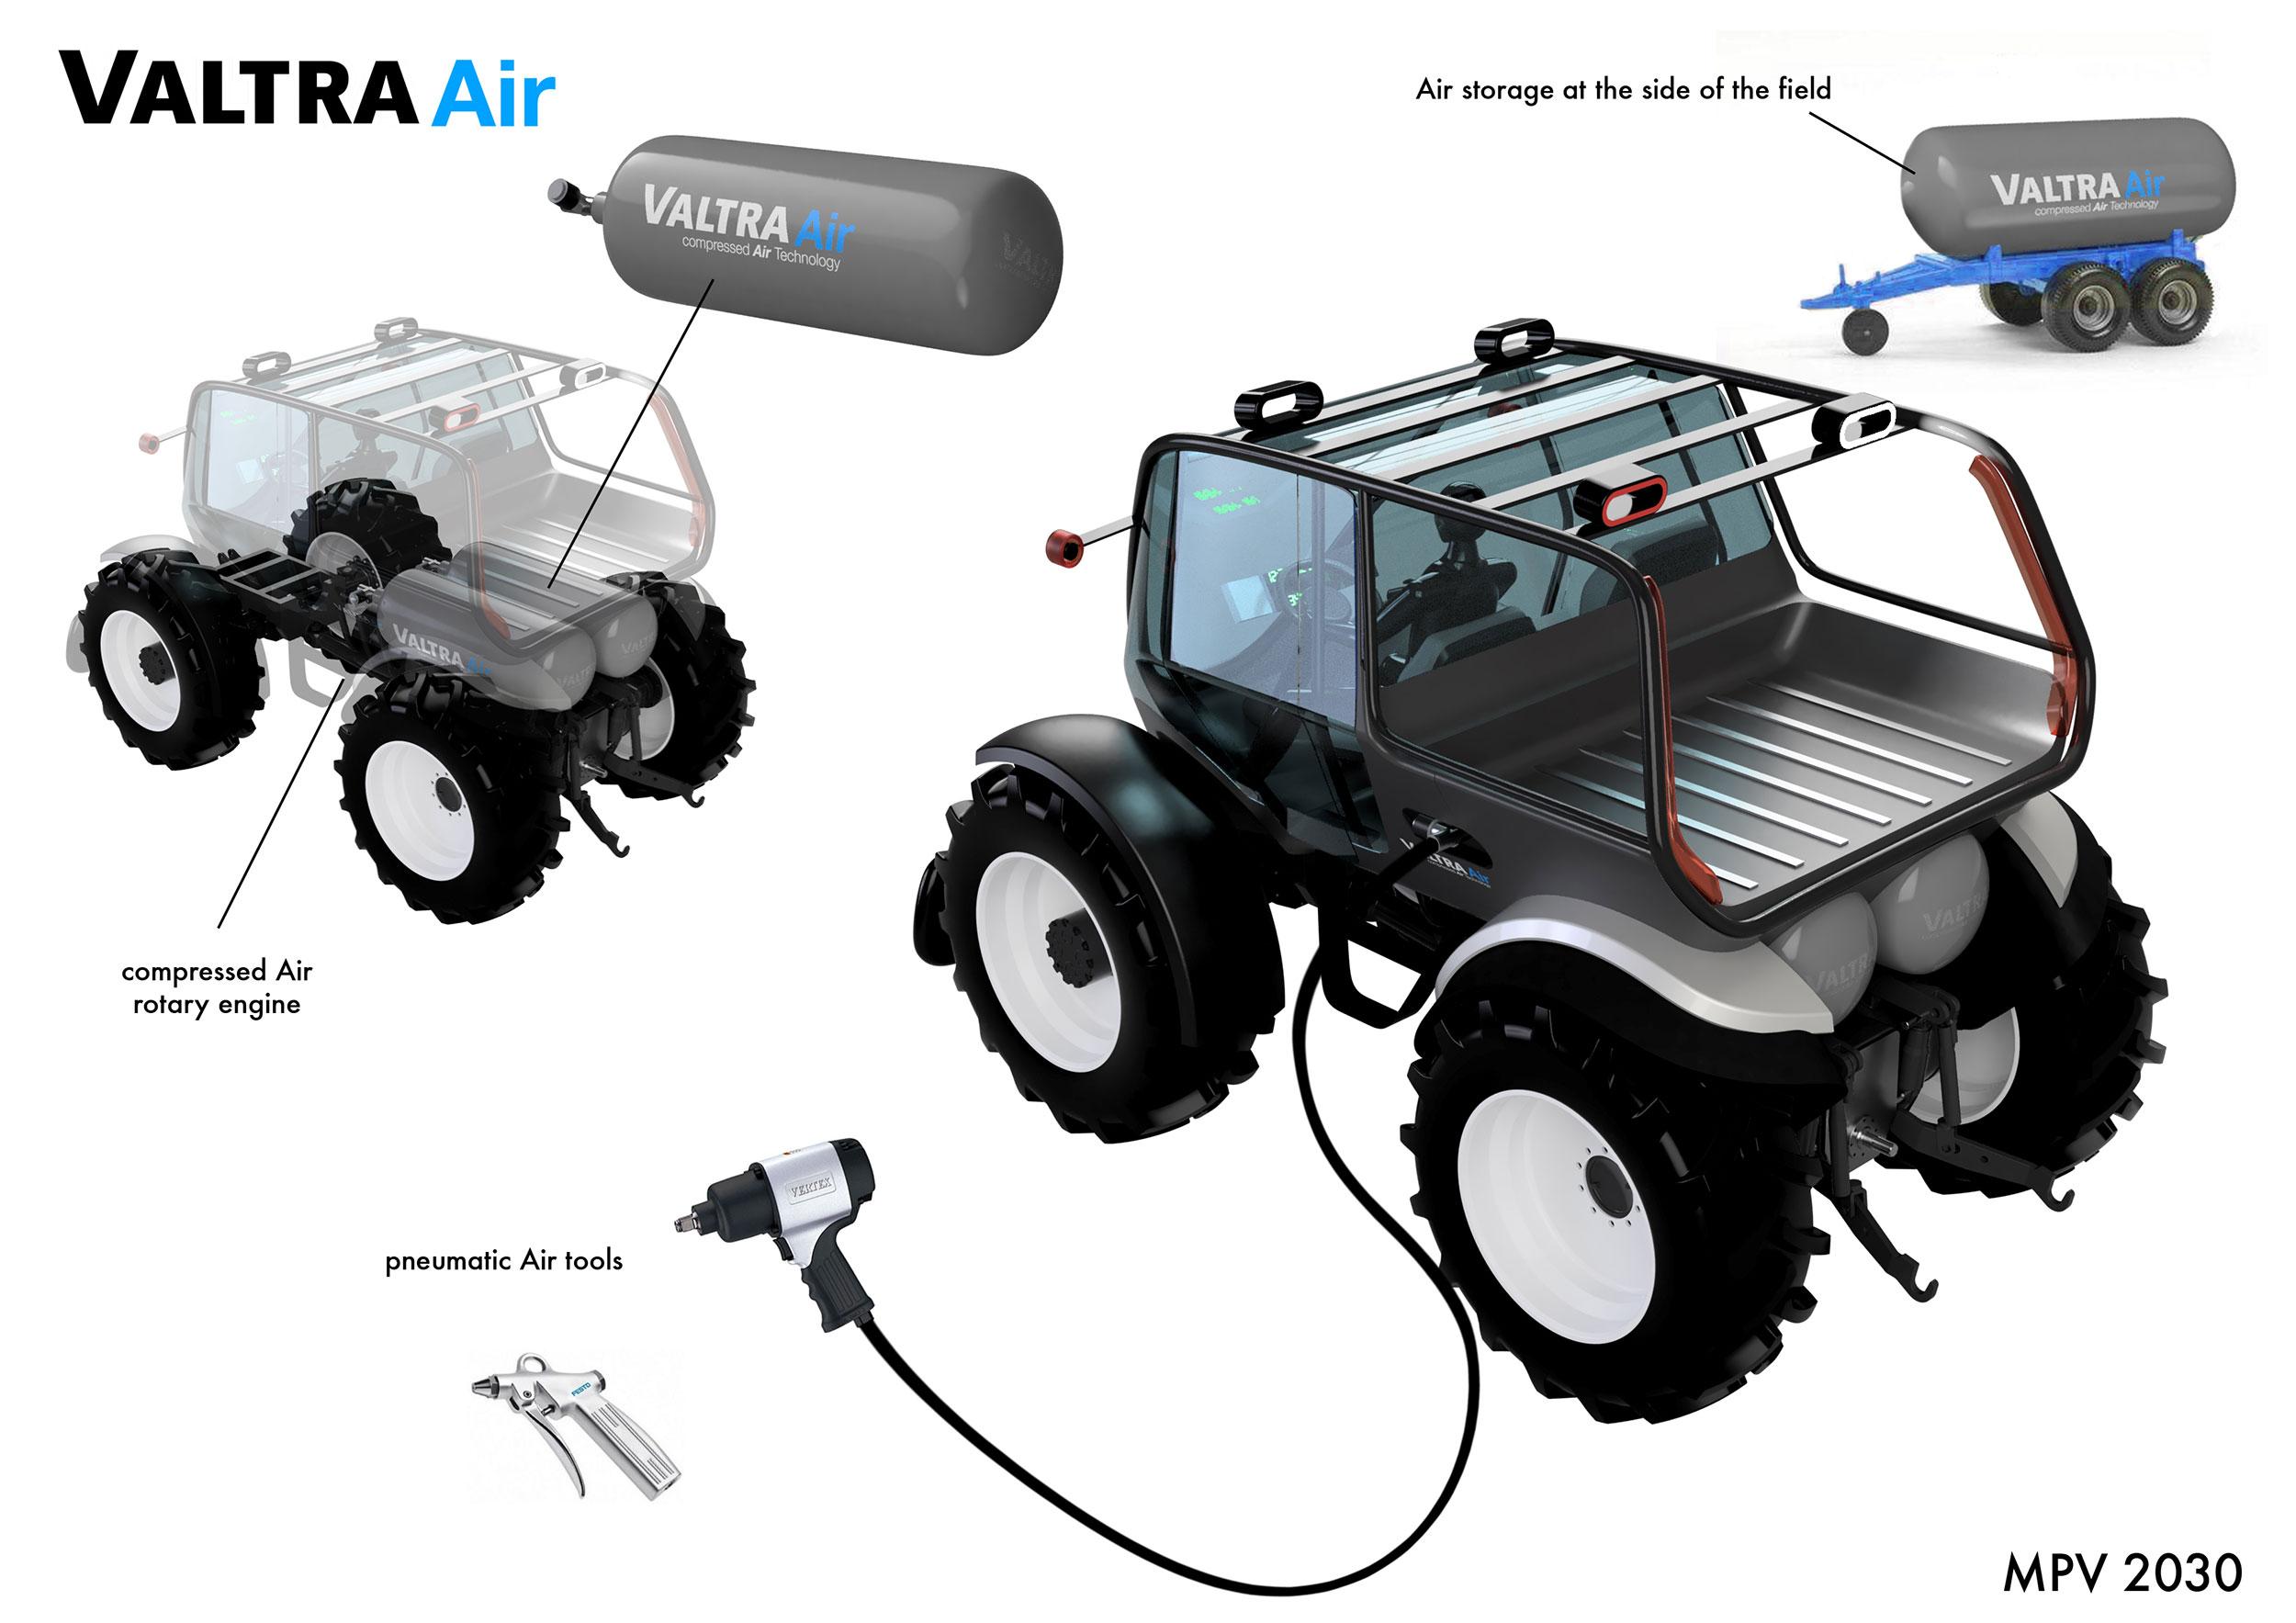 Valtra-Air-page3